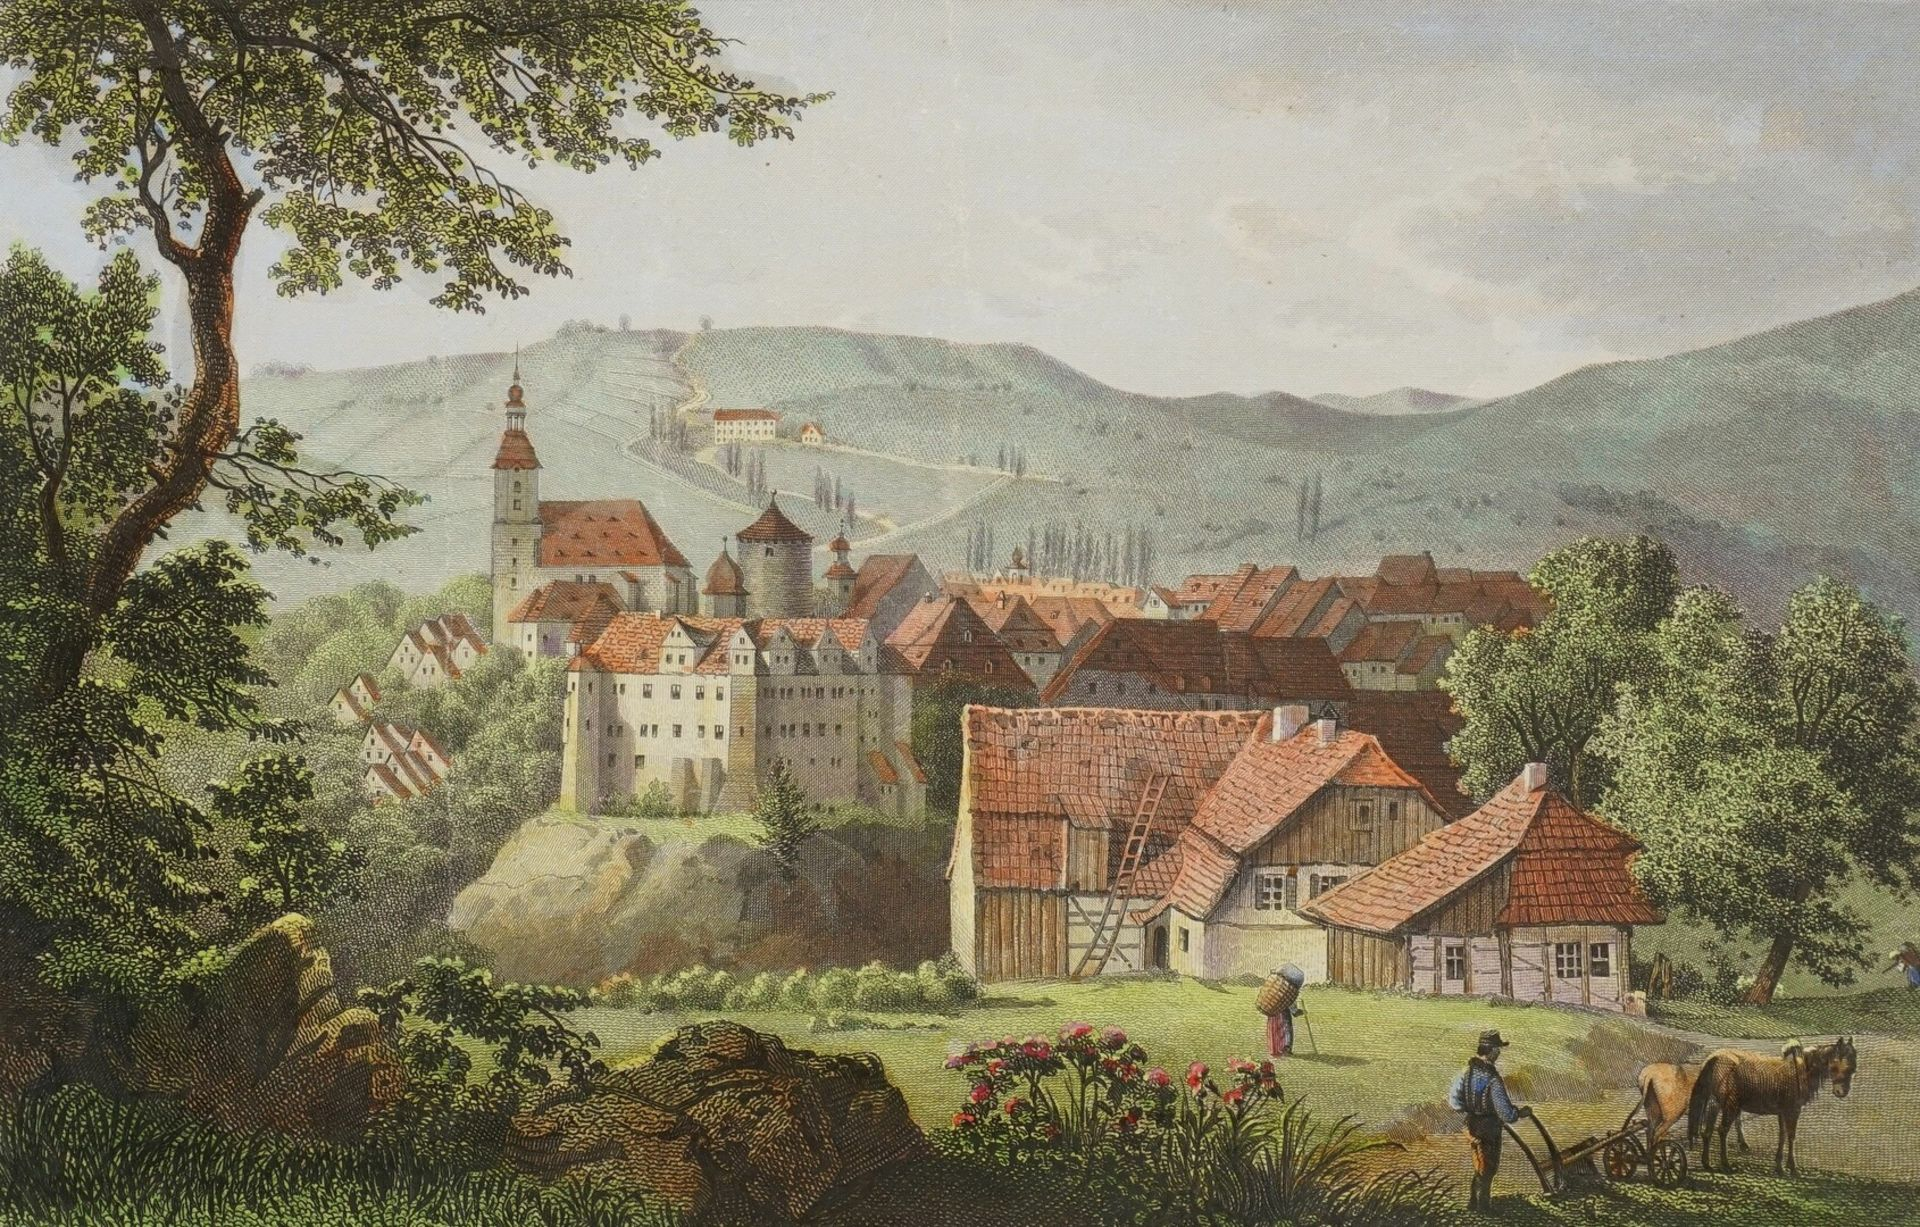 Zschopau (Erzgebirge)